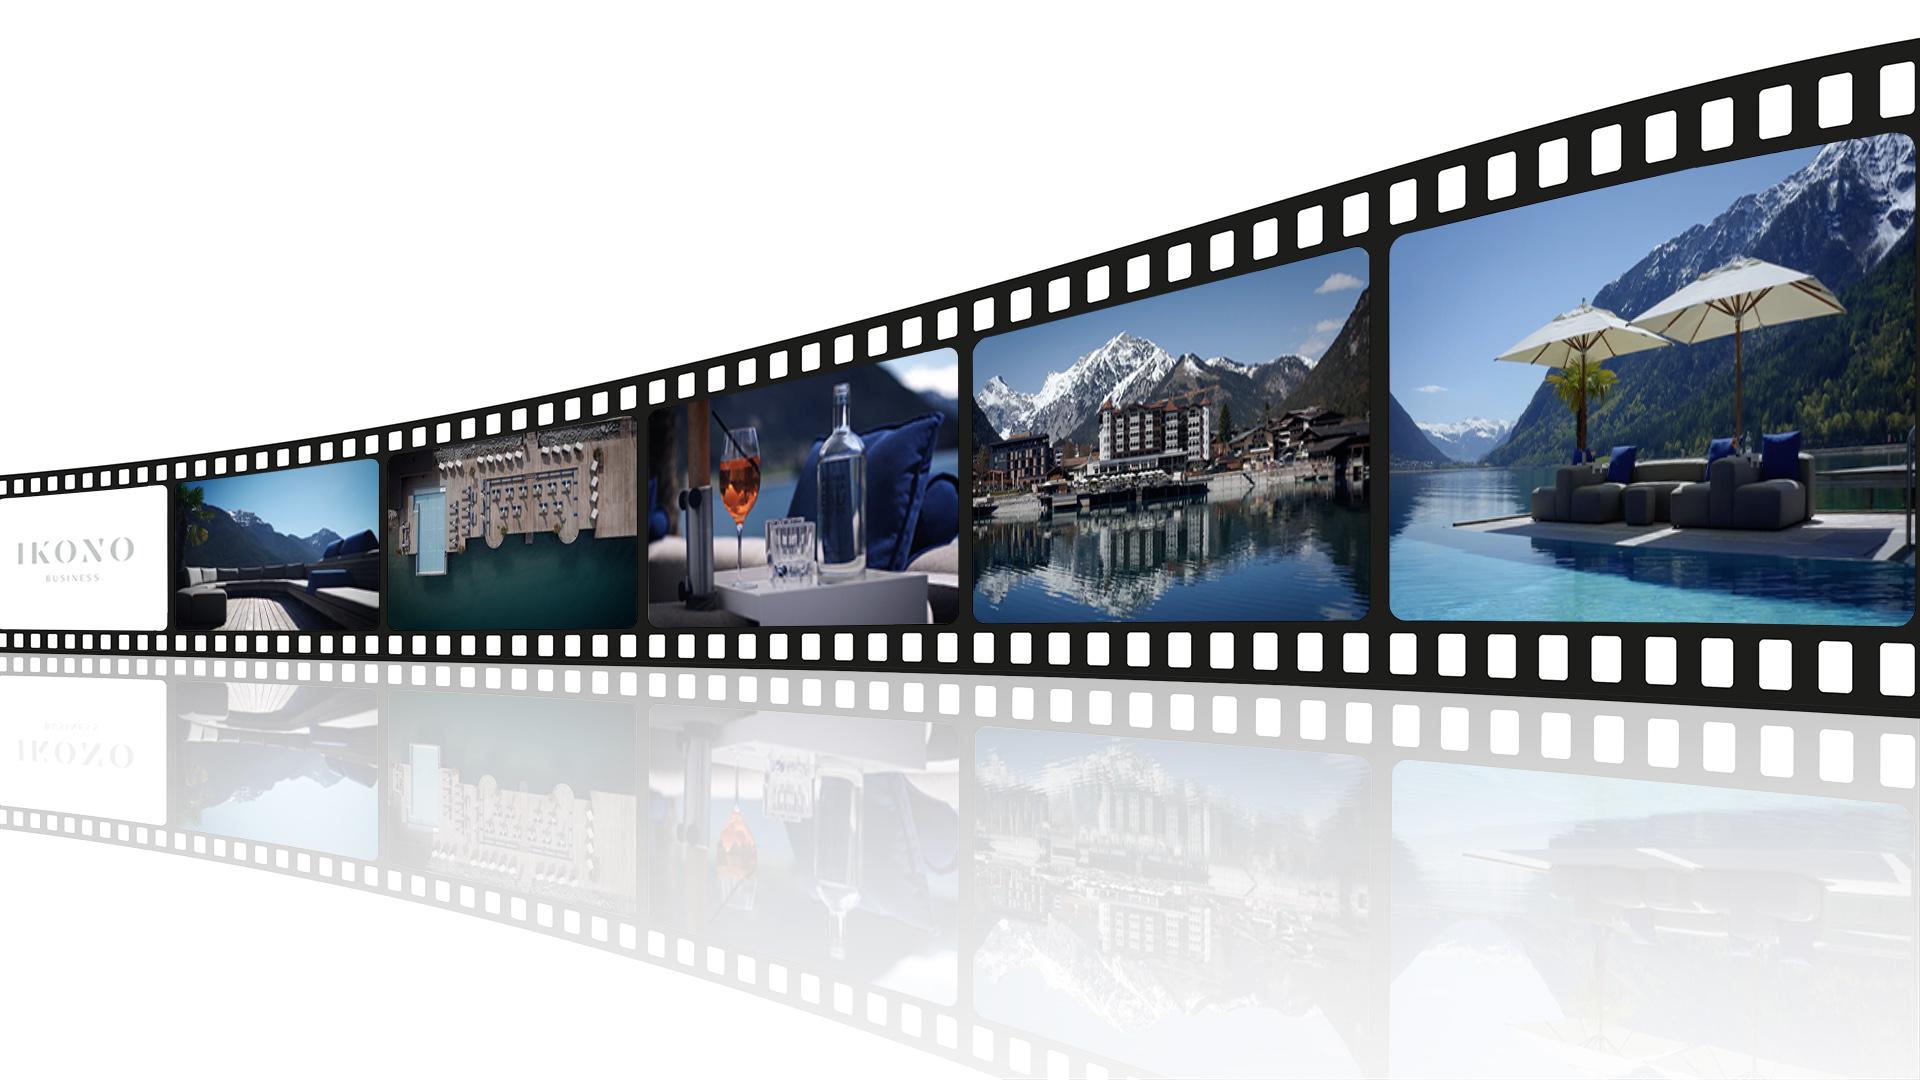 Videoproduktion-Kundenprojekt-Referenz-HafenRaum.jpg